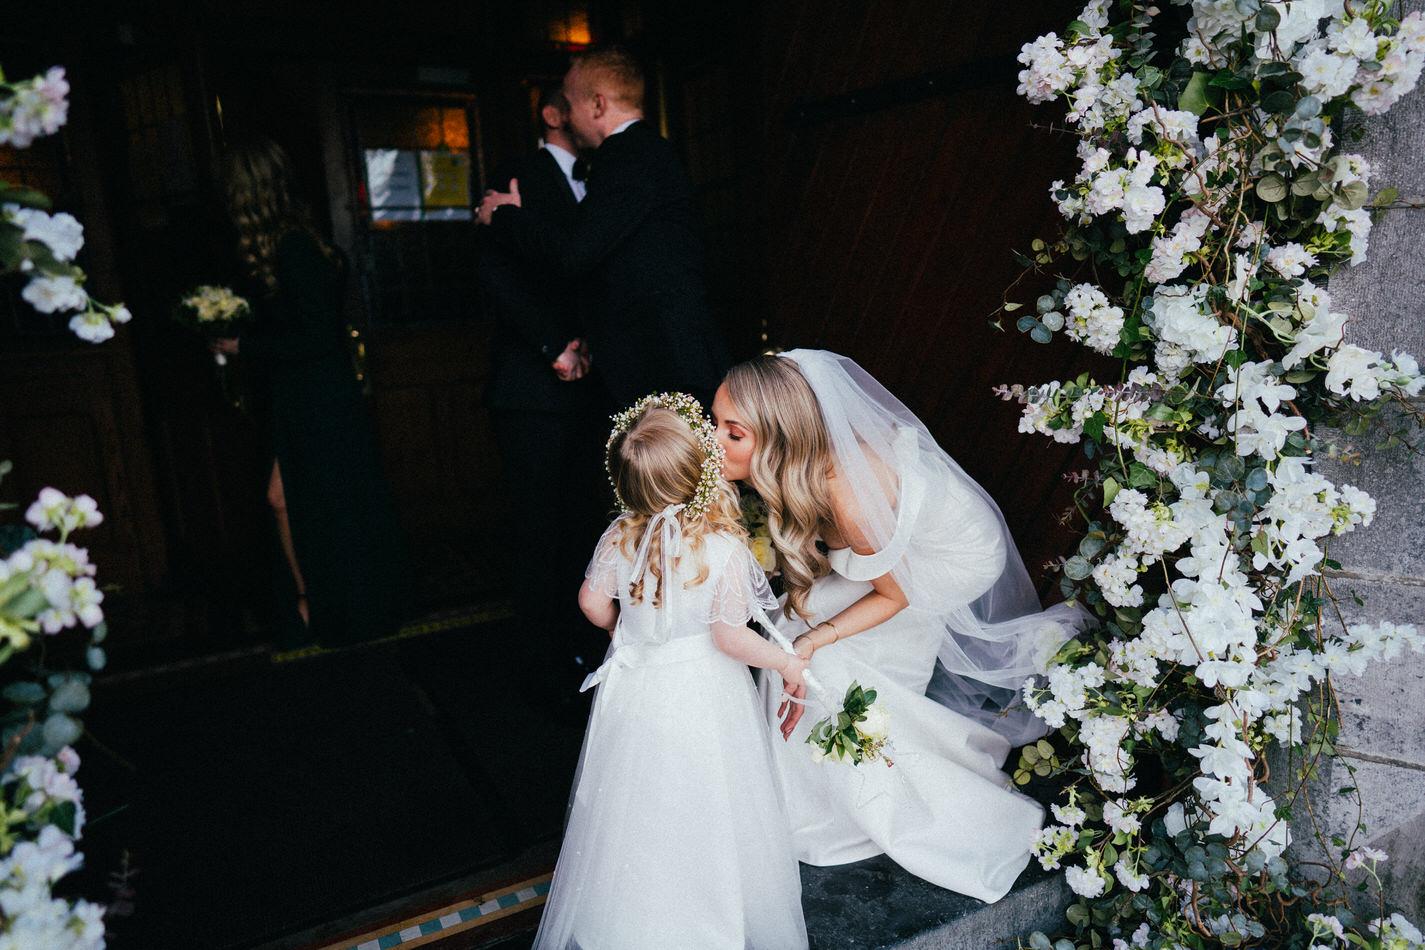 Castle-wedding-ireland-photos- 0151 103